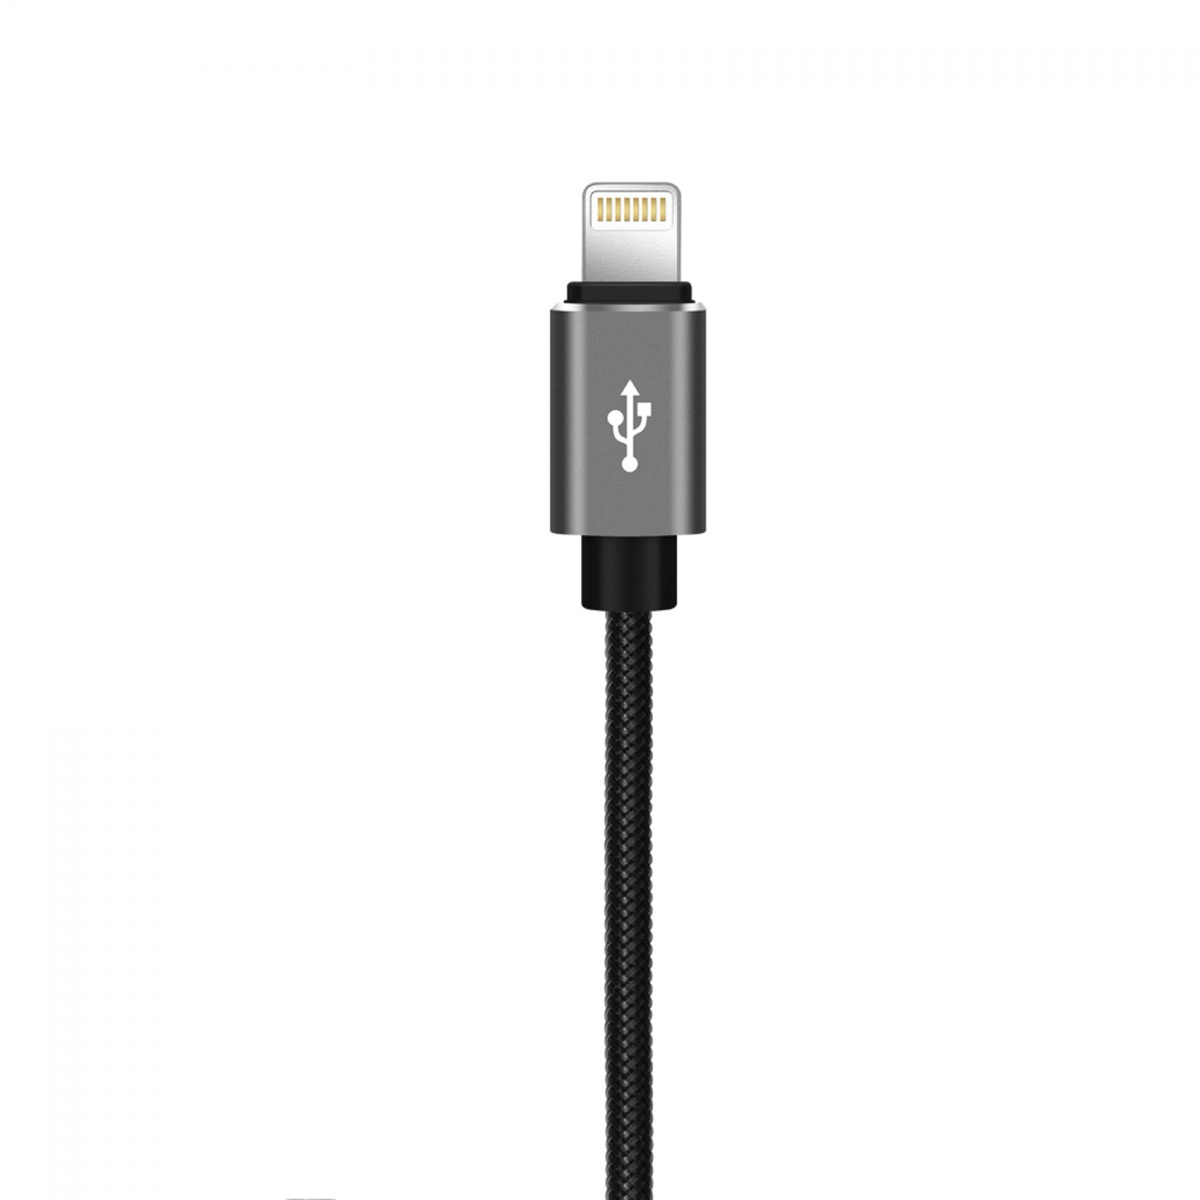 XO NB31 Lightning USB Elbow Alloy 2.4A Cable - Black